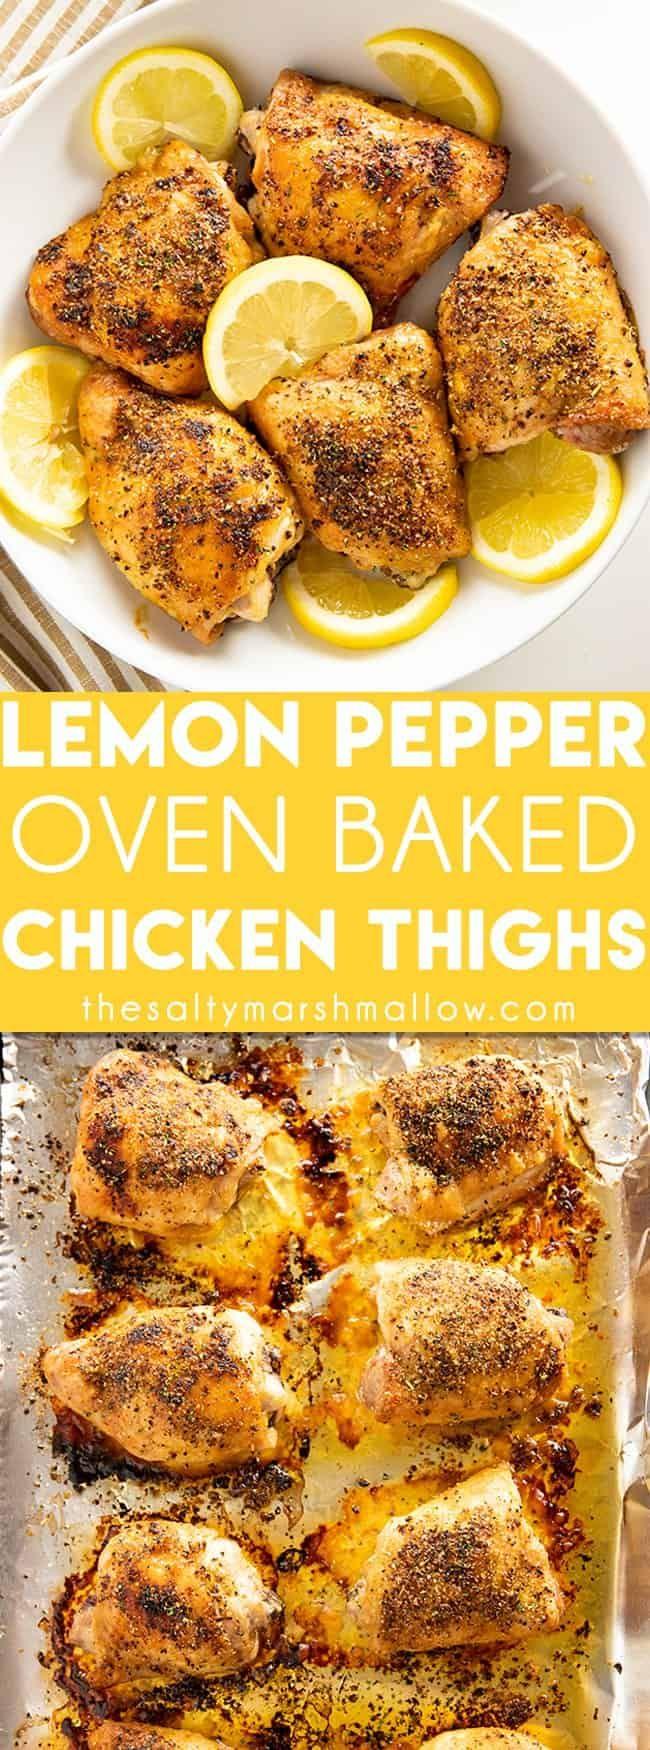 Zitronenpfeffer gebackene Hühnerschenkel